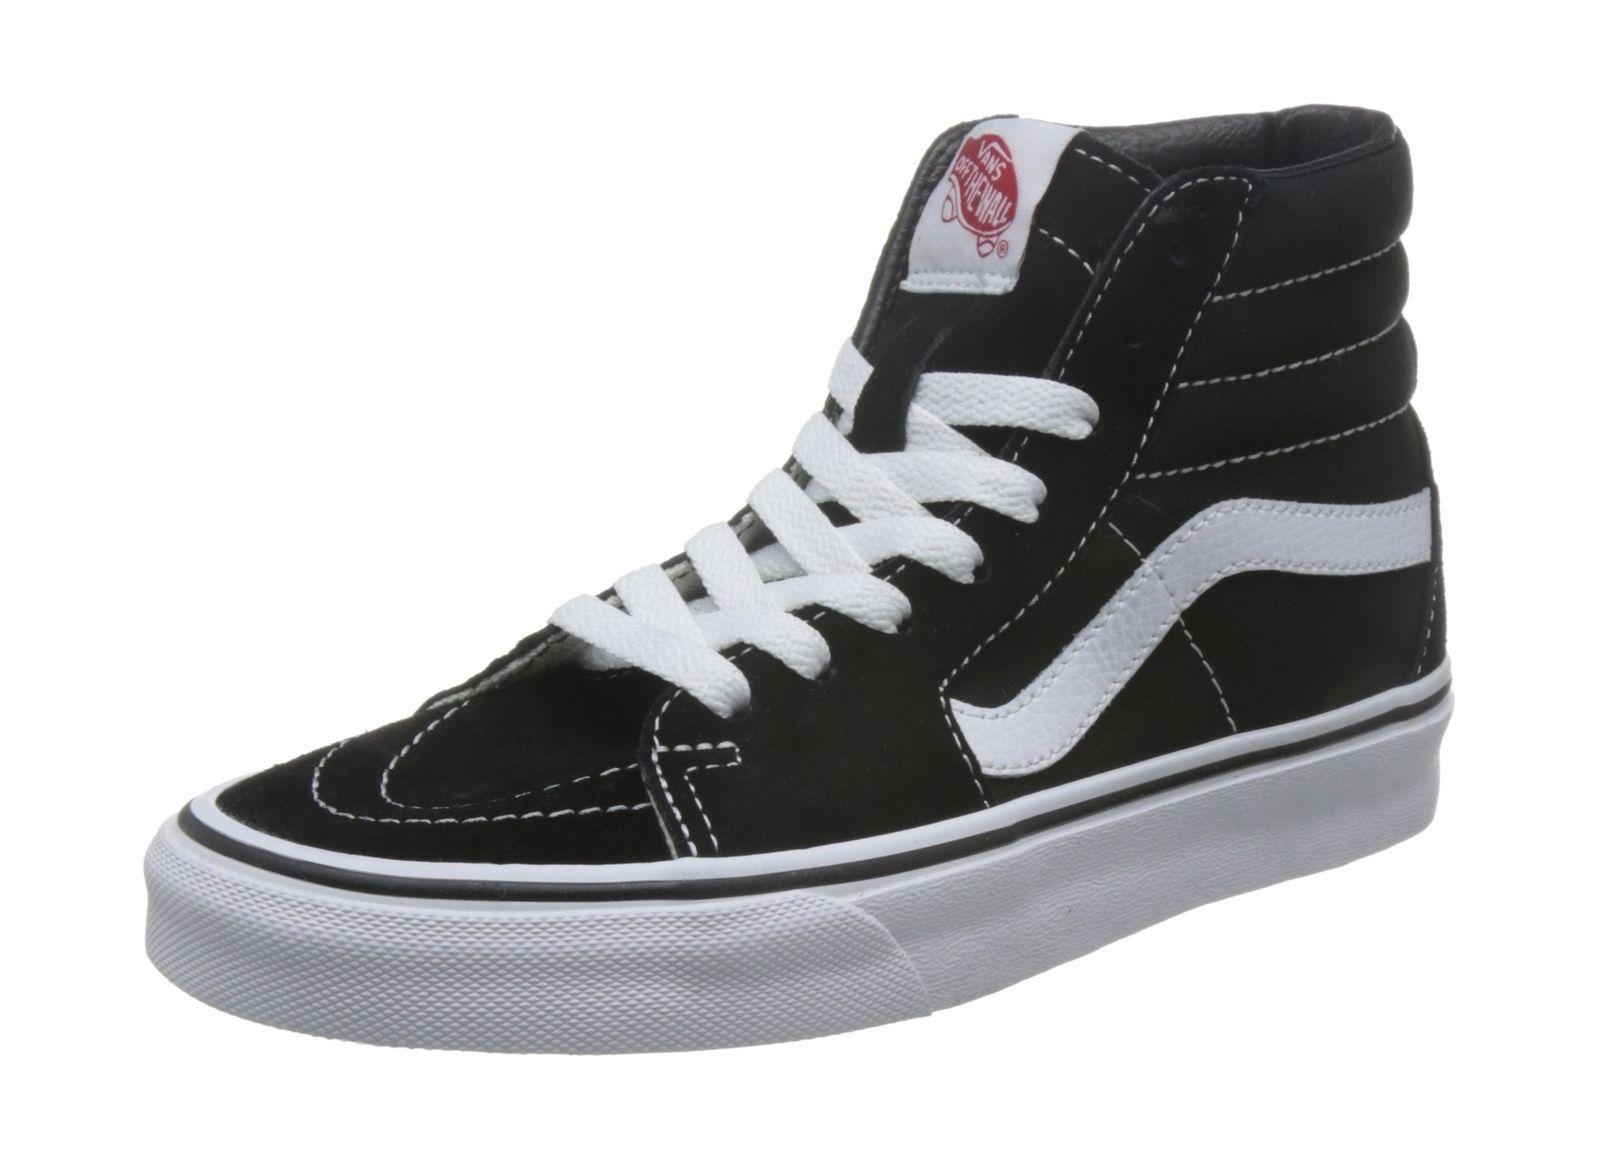 Vans Sk8hi Classic Suede/Canvas Unisex Adulti HiTop Sneaker UK 2.5